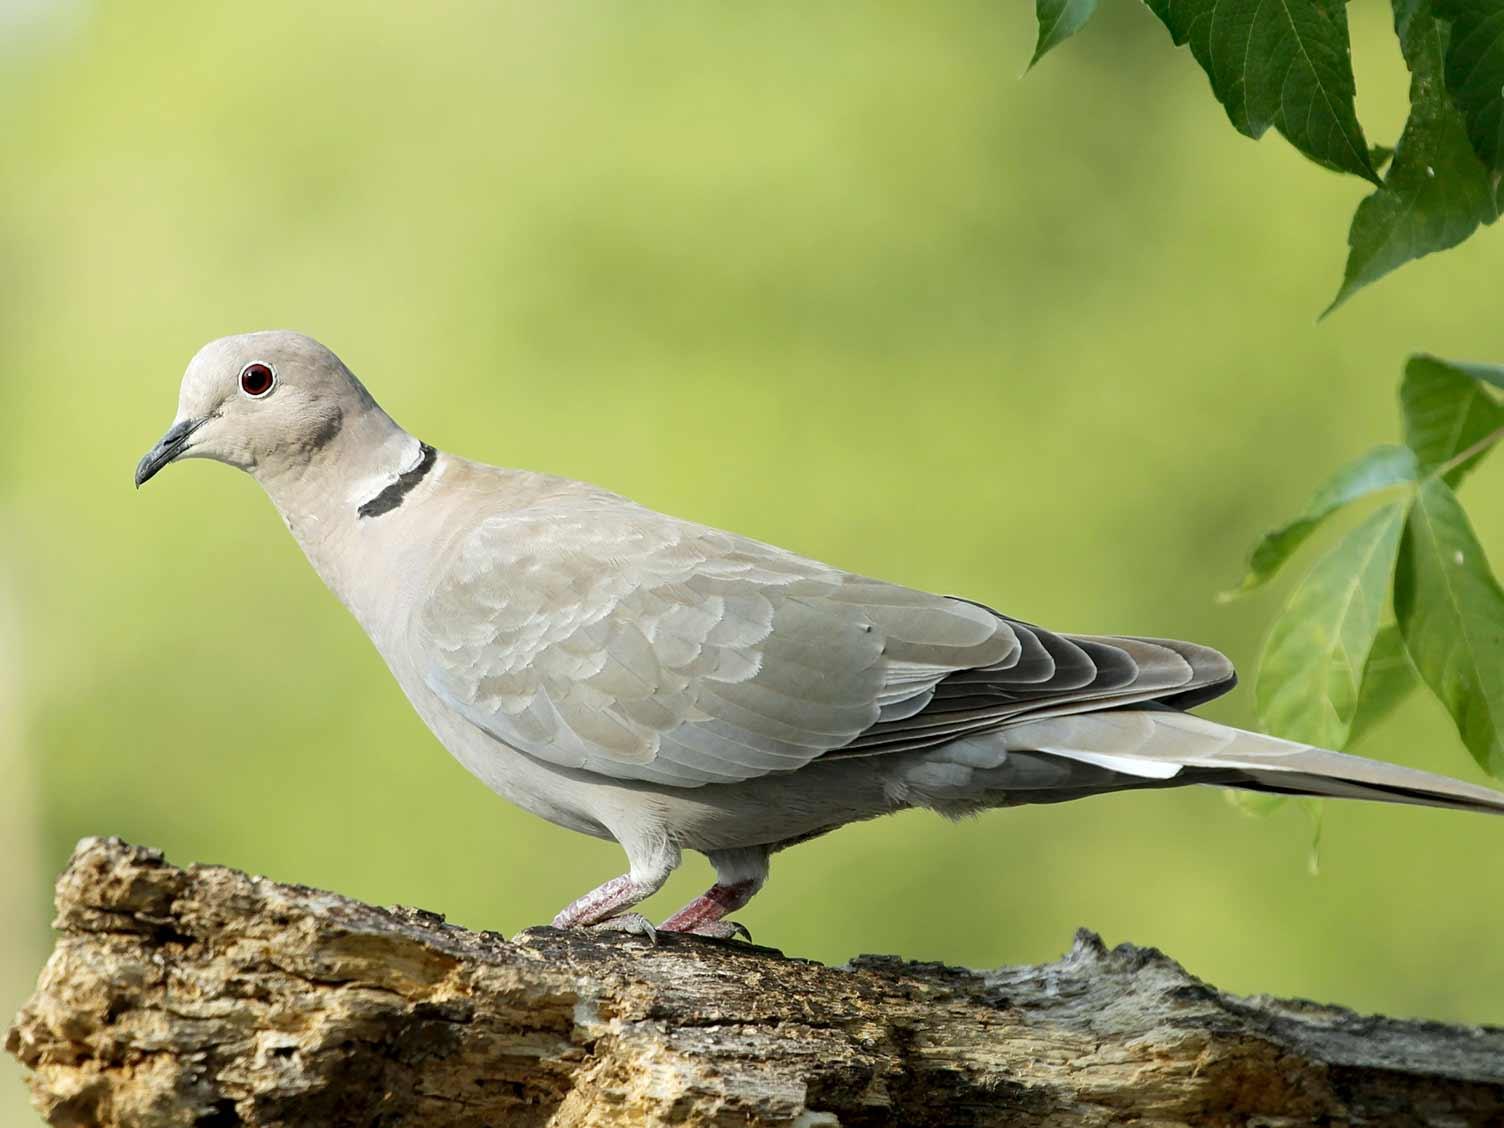 Common UK birds: Collared dove